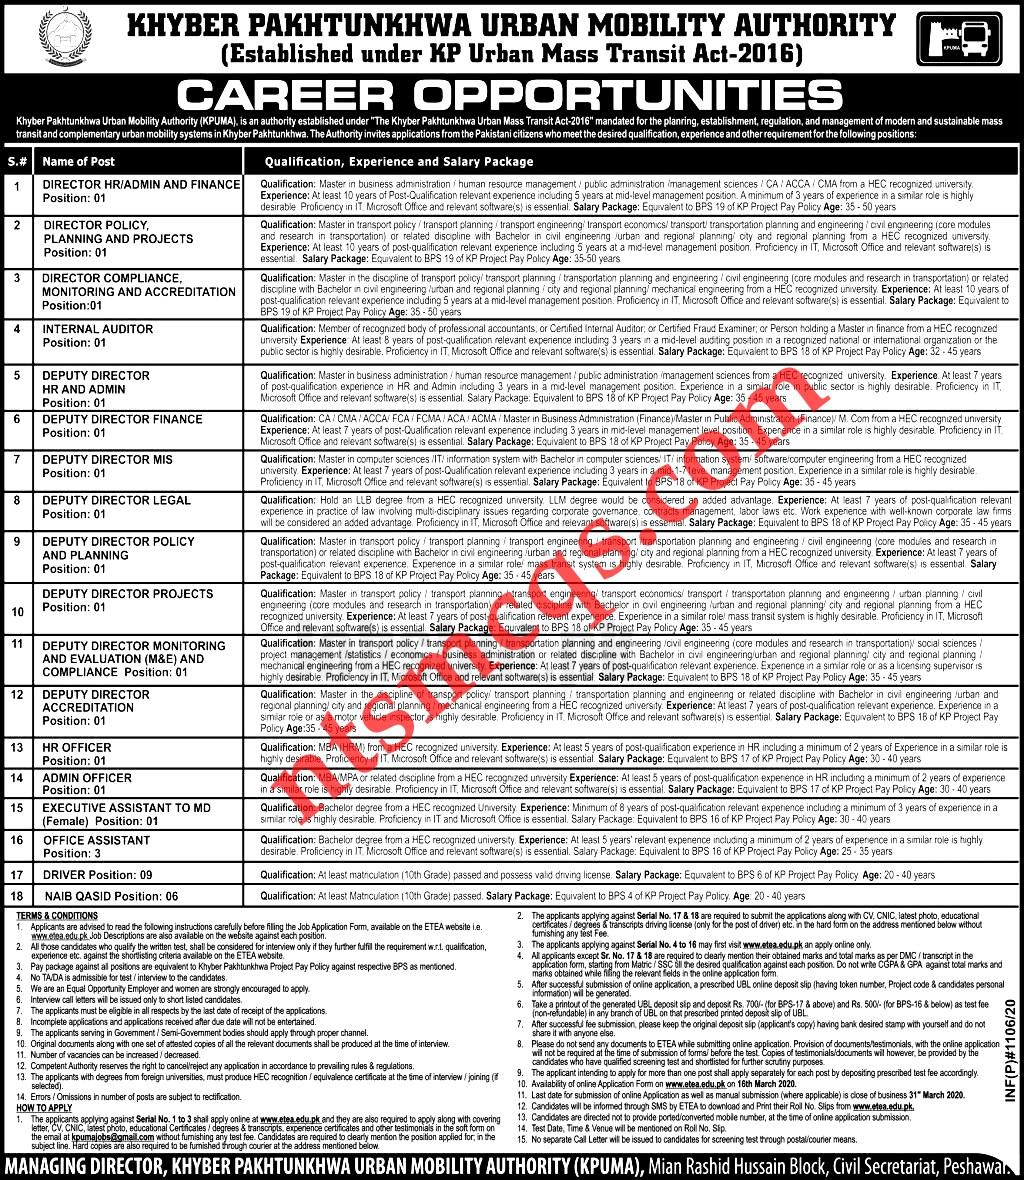 Khyber Pakhtunkhwa Urban Mobility Authority KPUMA ETEA Jobs 2021 Application Form Roll No Slip